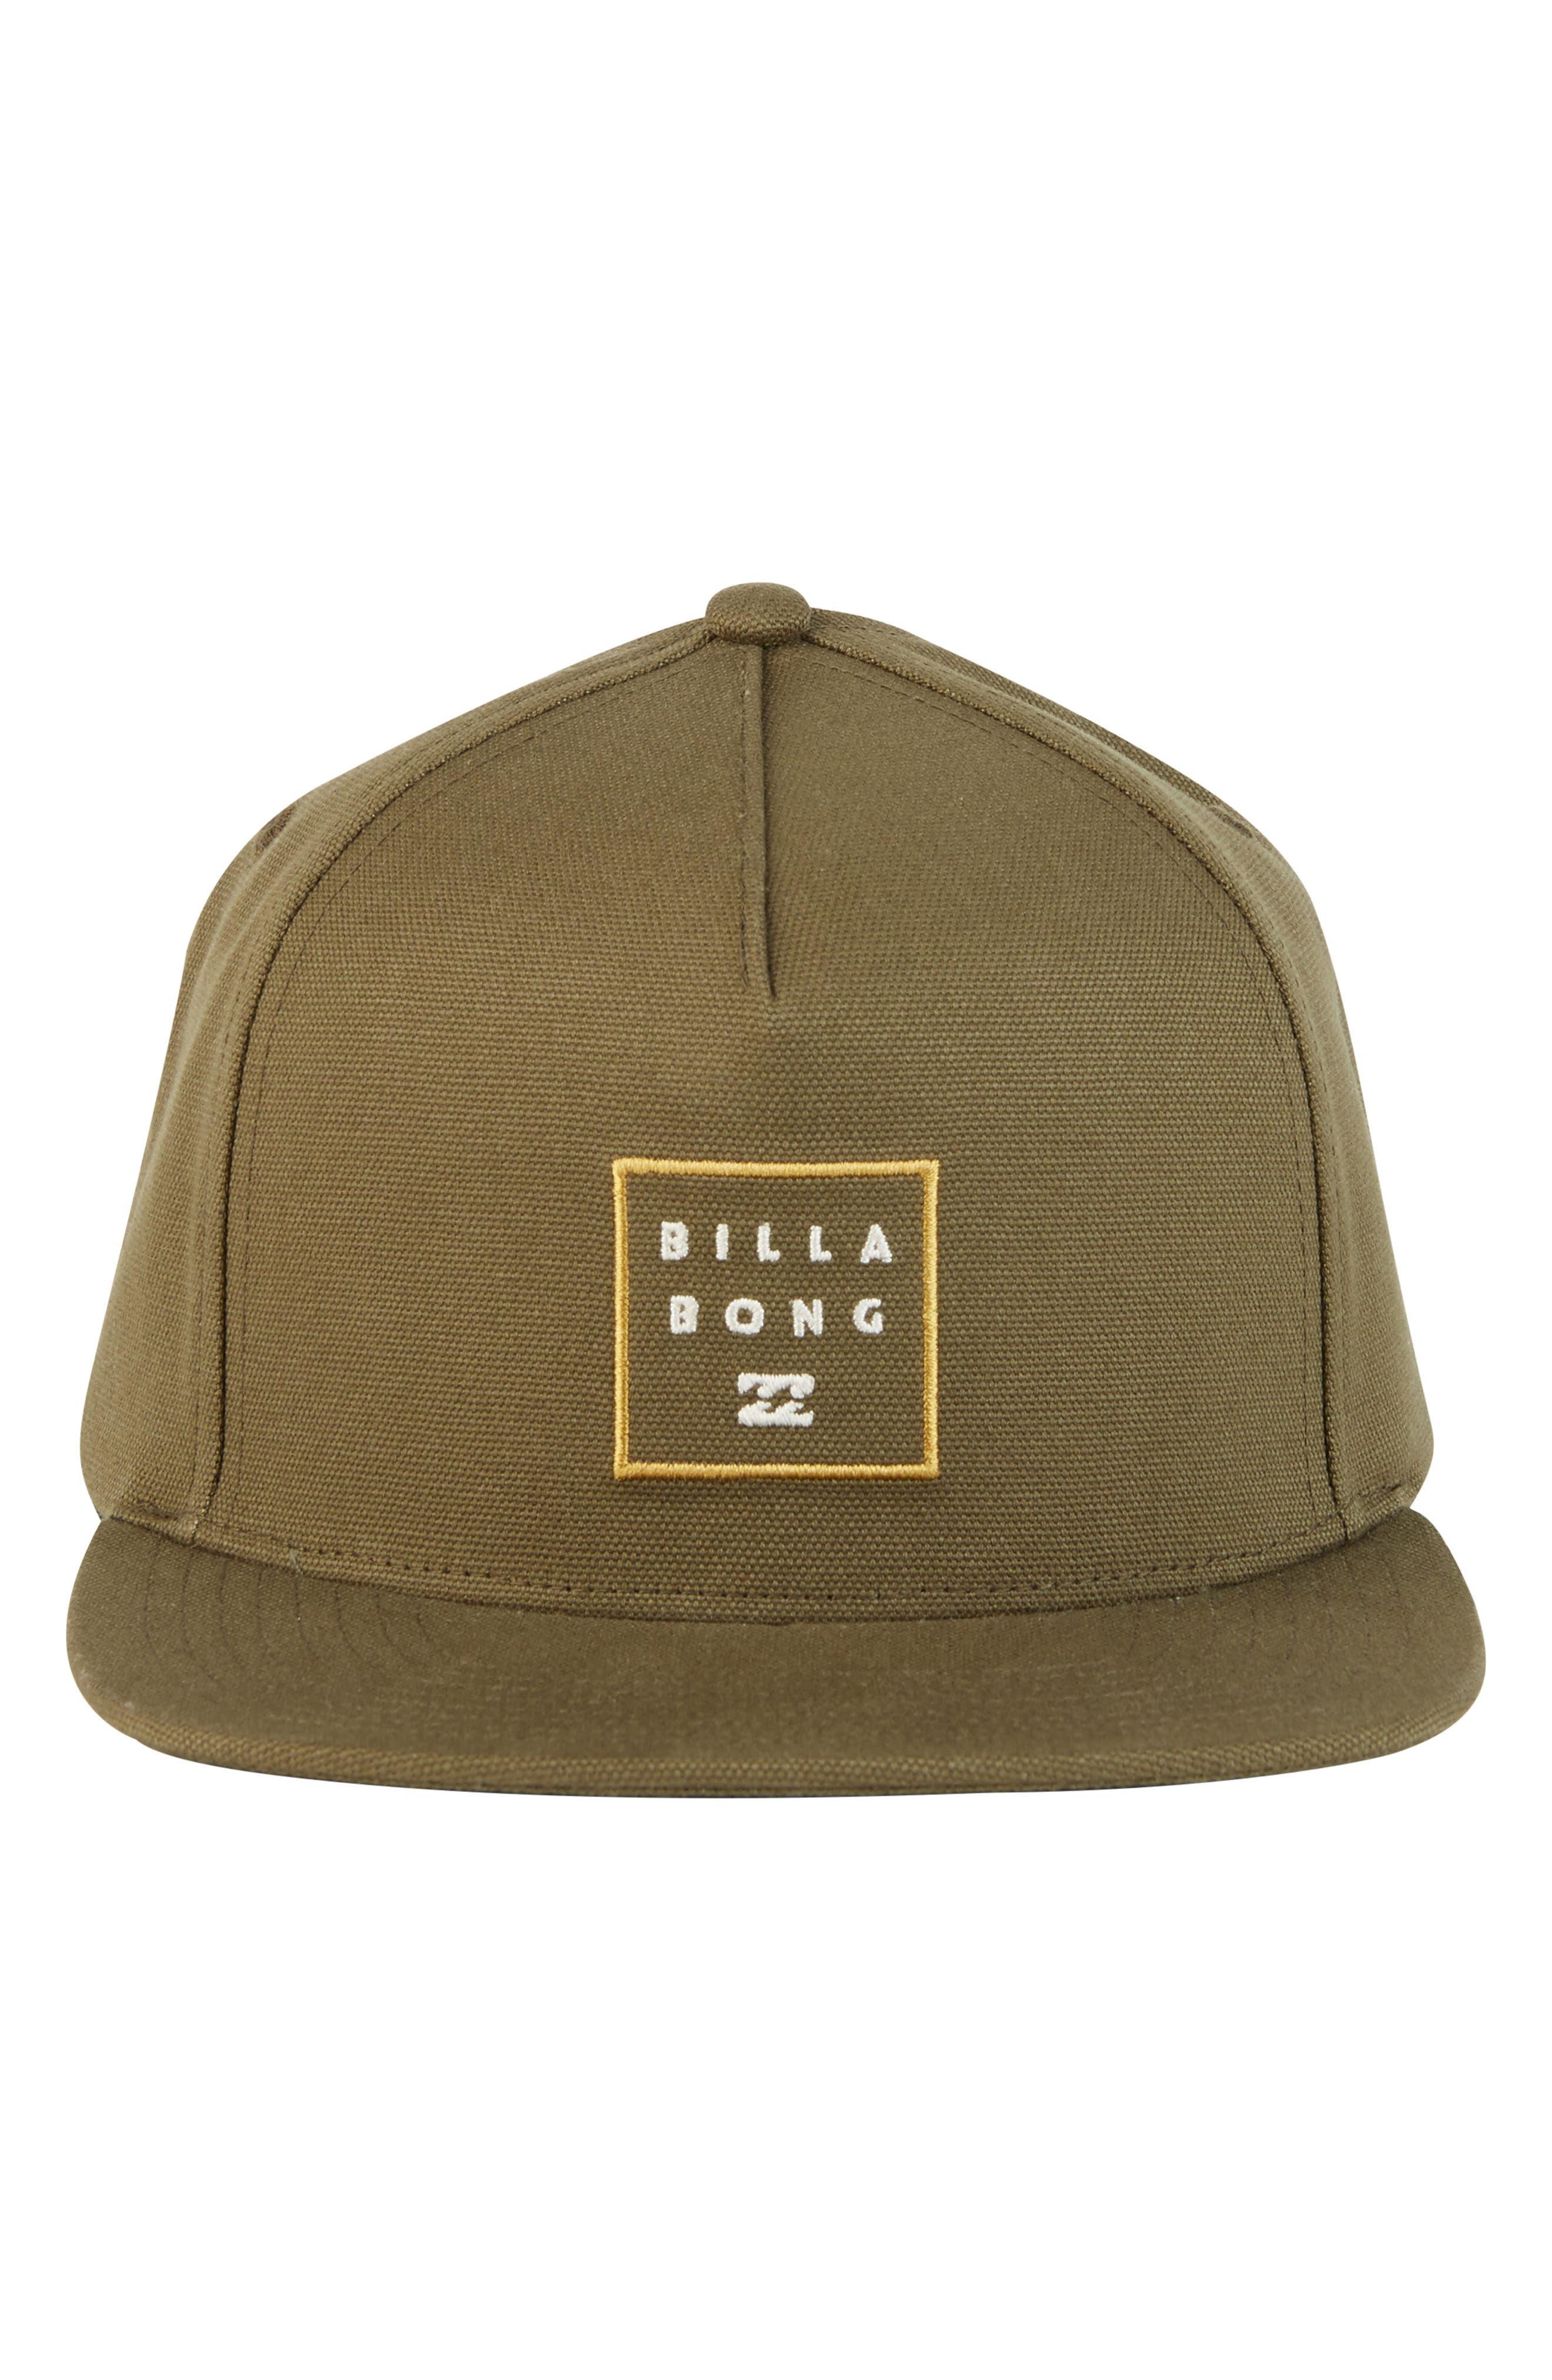 Stacked Snapback Baseball Cap,                             Alternate thumbnail 3, color,                             Olive